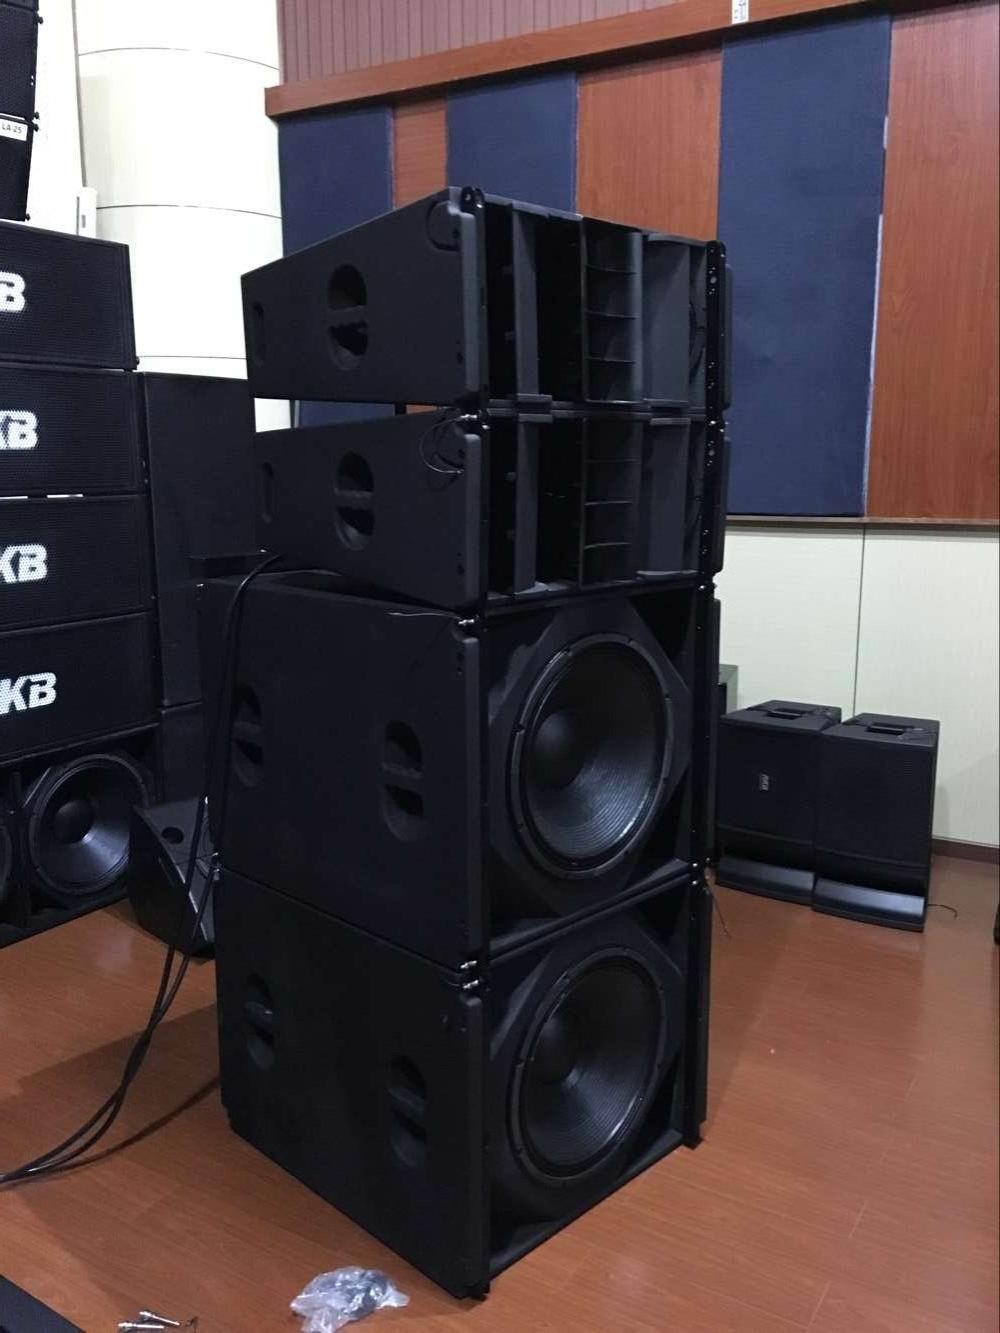 outdoor best dj speaker long throw speaker 18 inch speaker view outdoor best dj speaker rkb. Black Bedroom Furniture Sets. Home Design Ideas